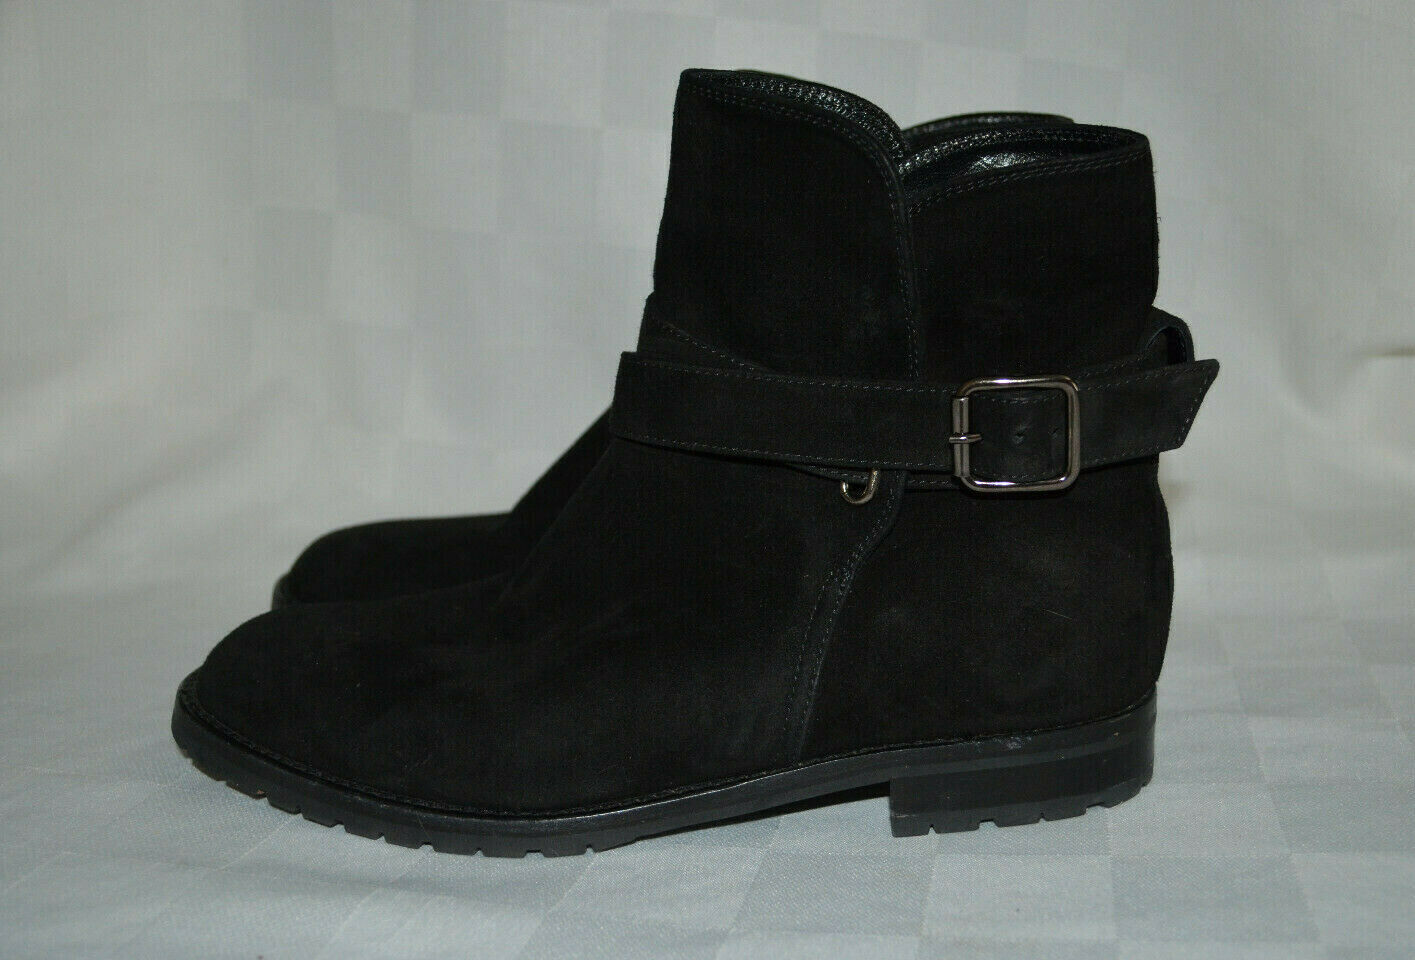 995 Sz 37 6.5 Manolo Blahnik Black Vintage Sulgambo Suede Ankle Boots Booties